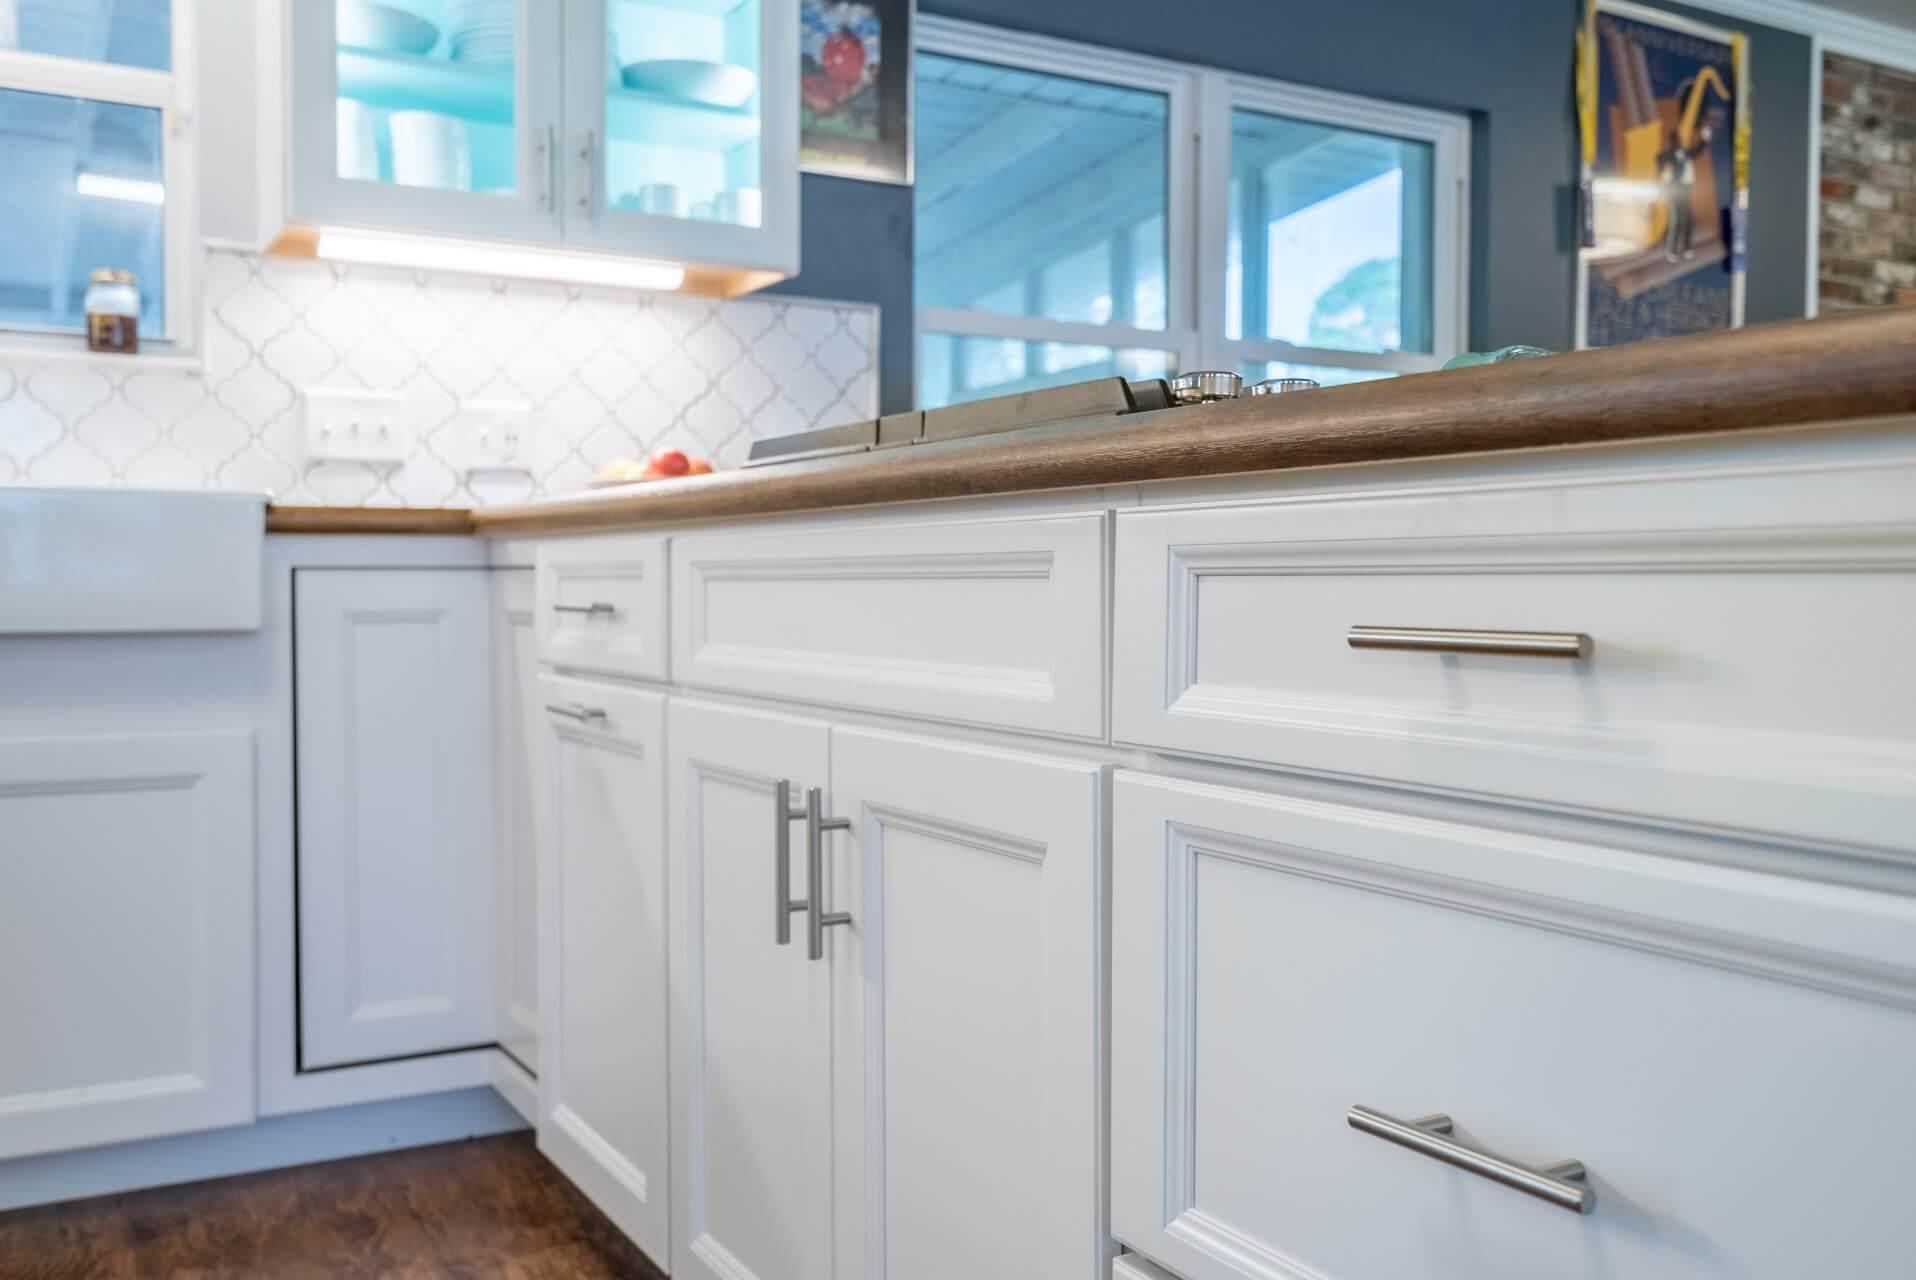 inset molding on cabinet doors